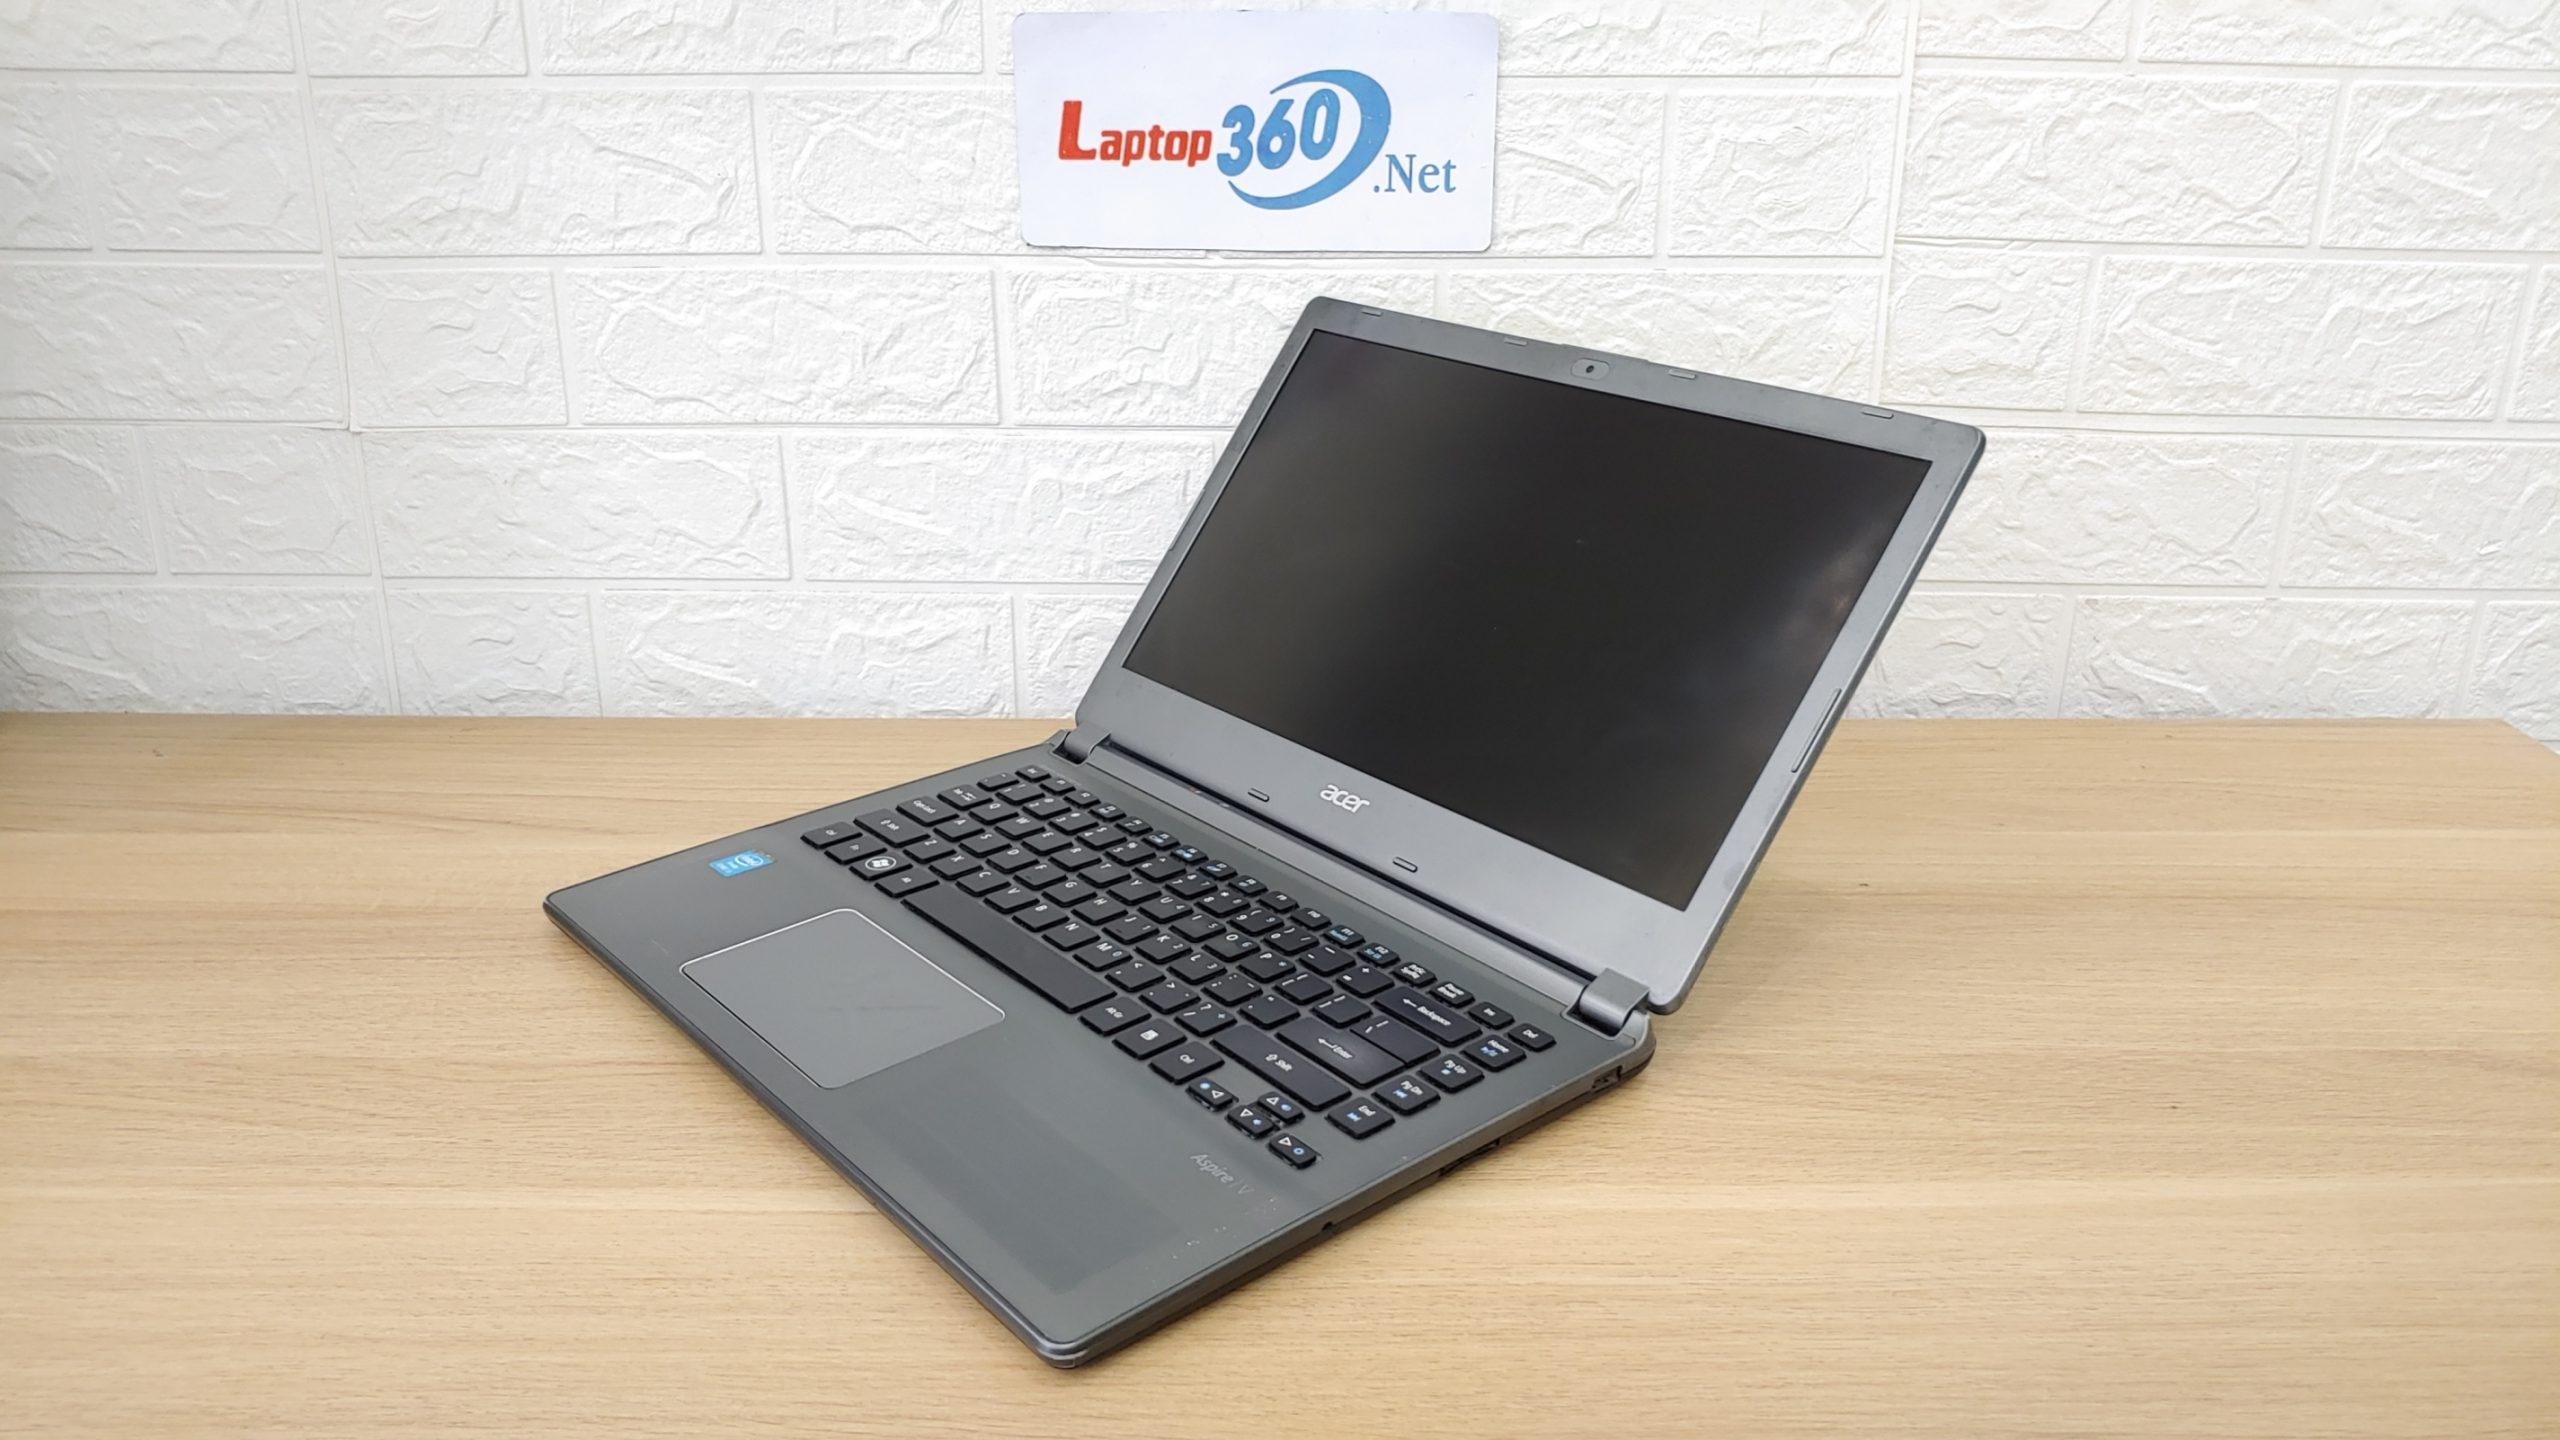 Acer Aspire V5-473